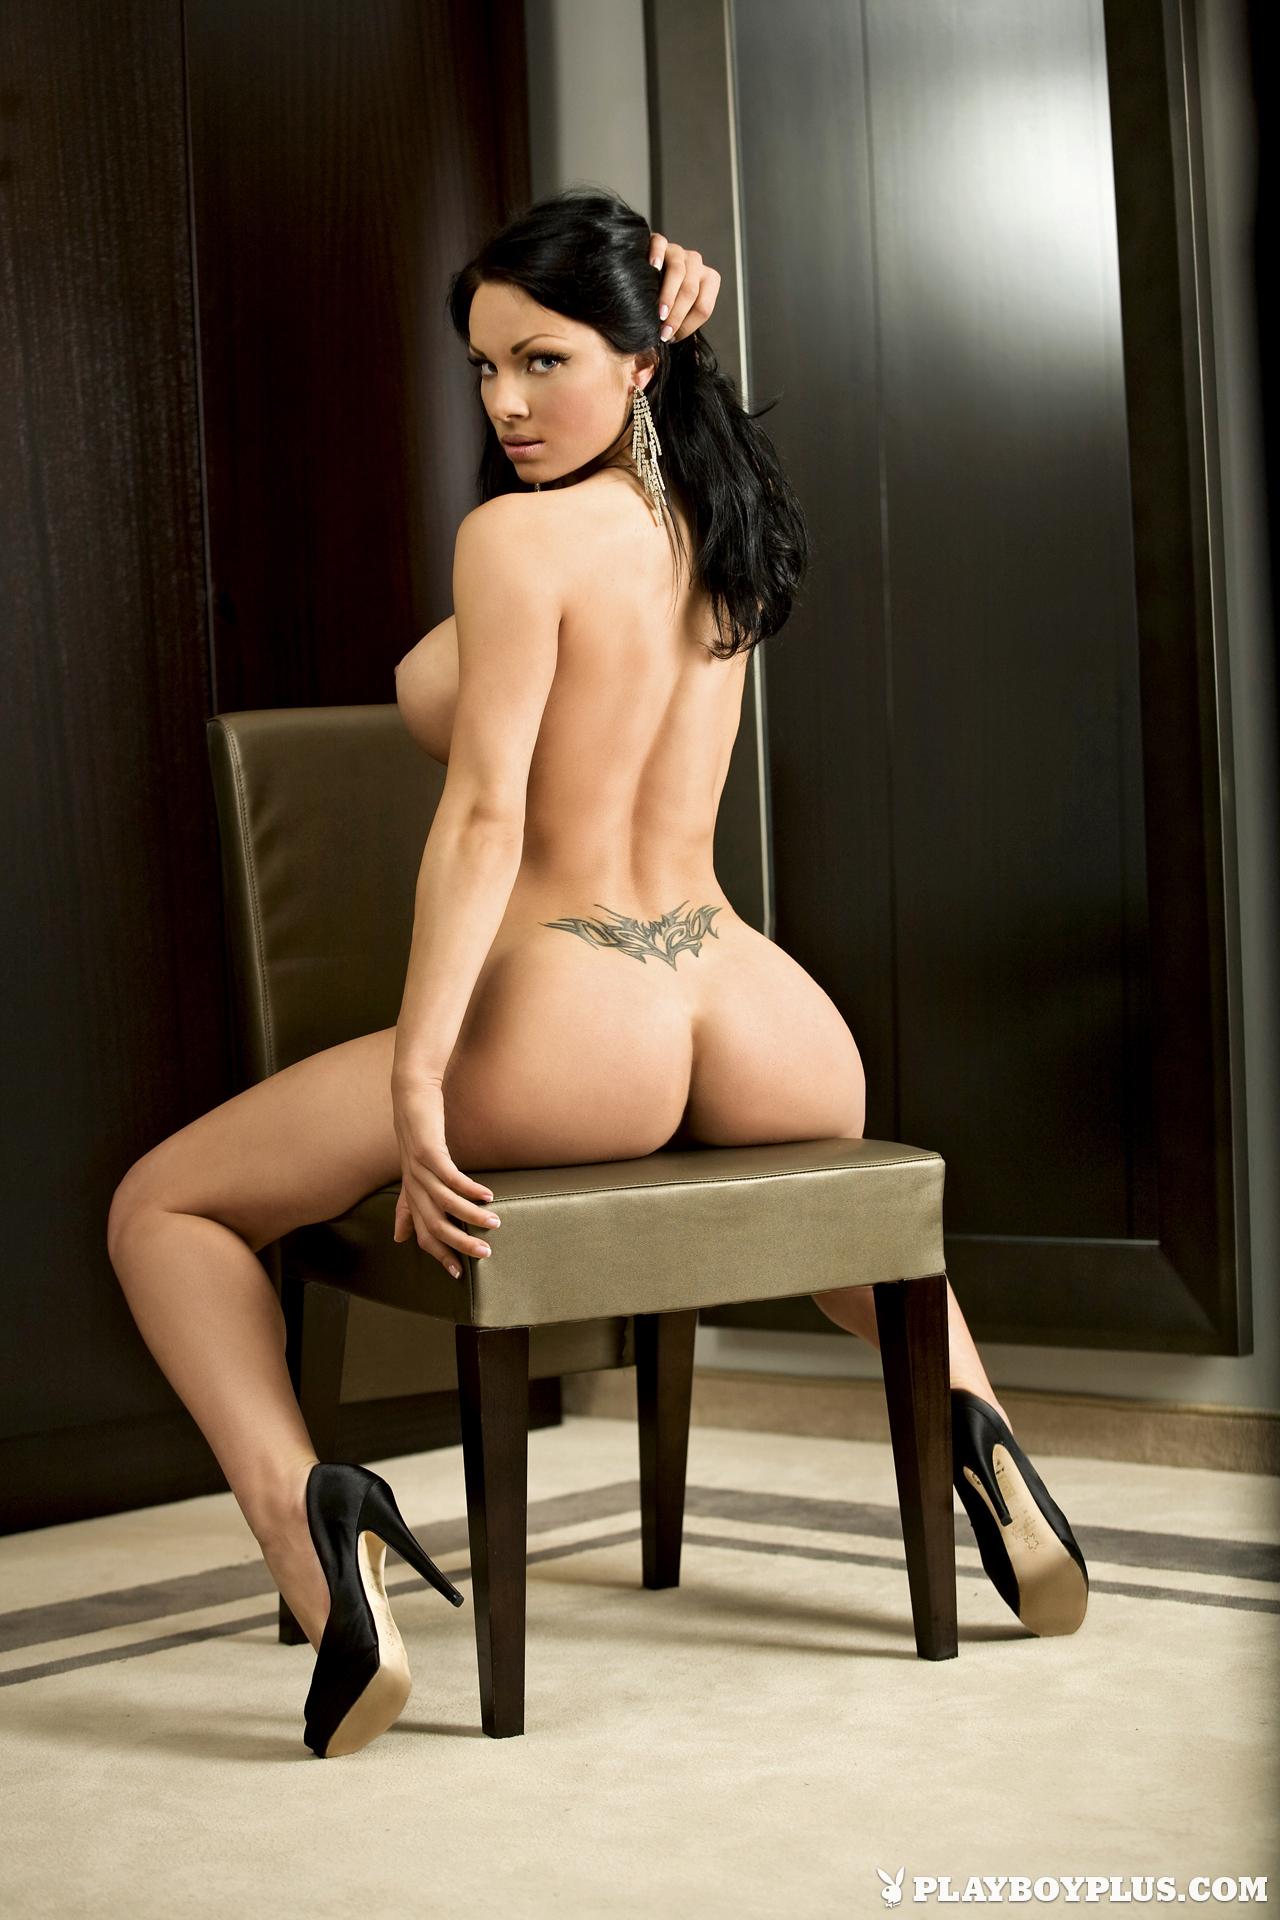 Viktorija Manzinni in Playboy Slovenia - Centerfolds Blog